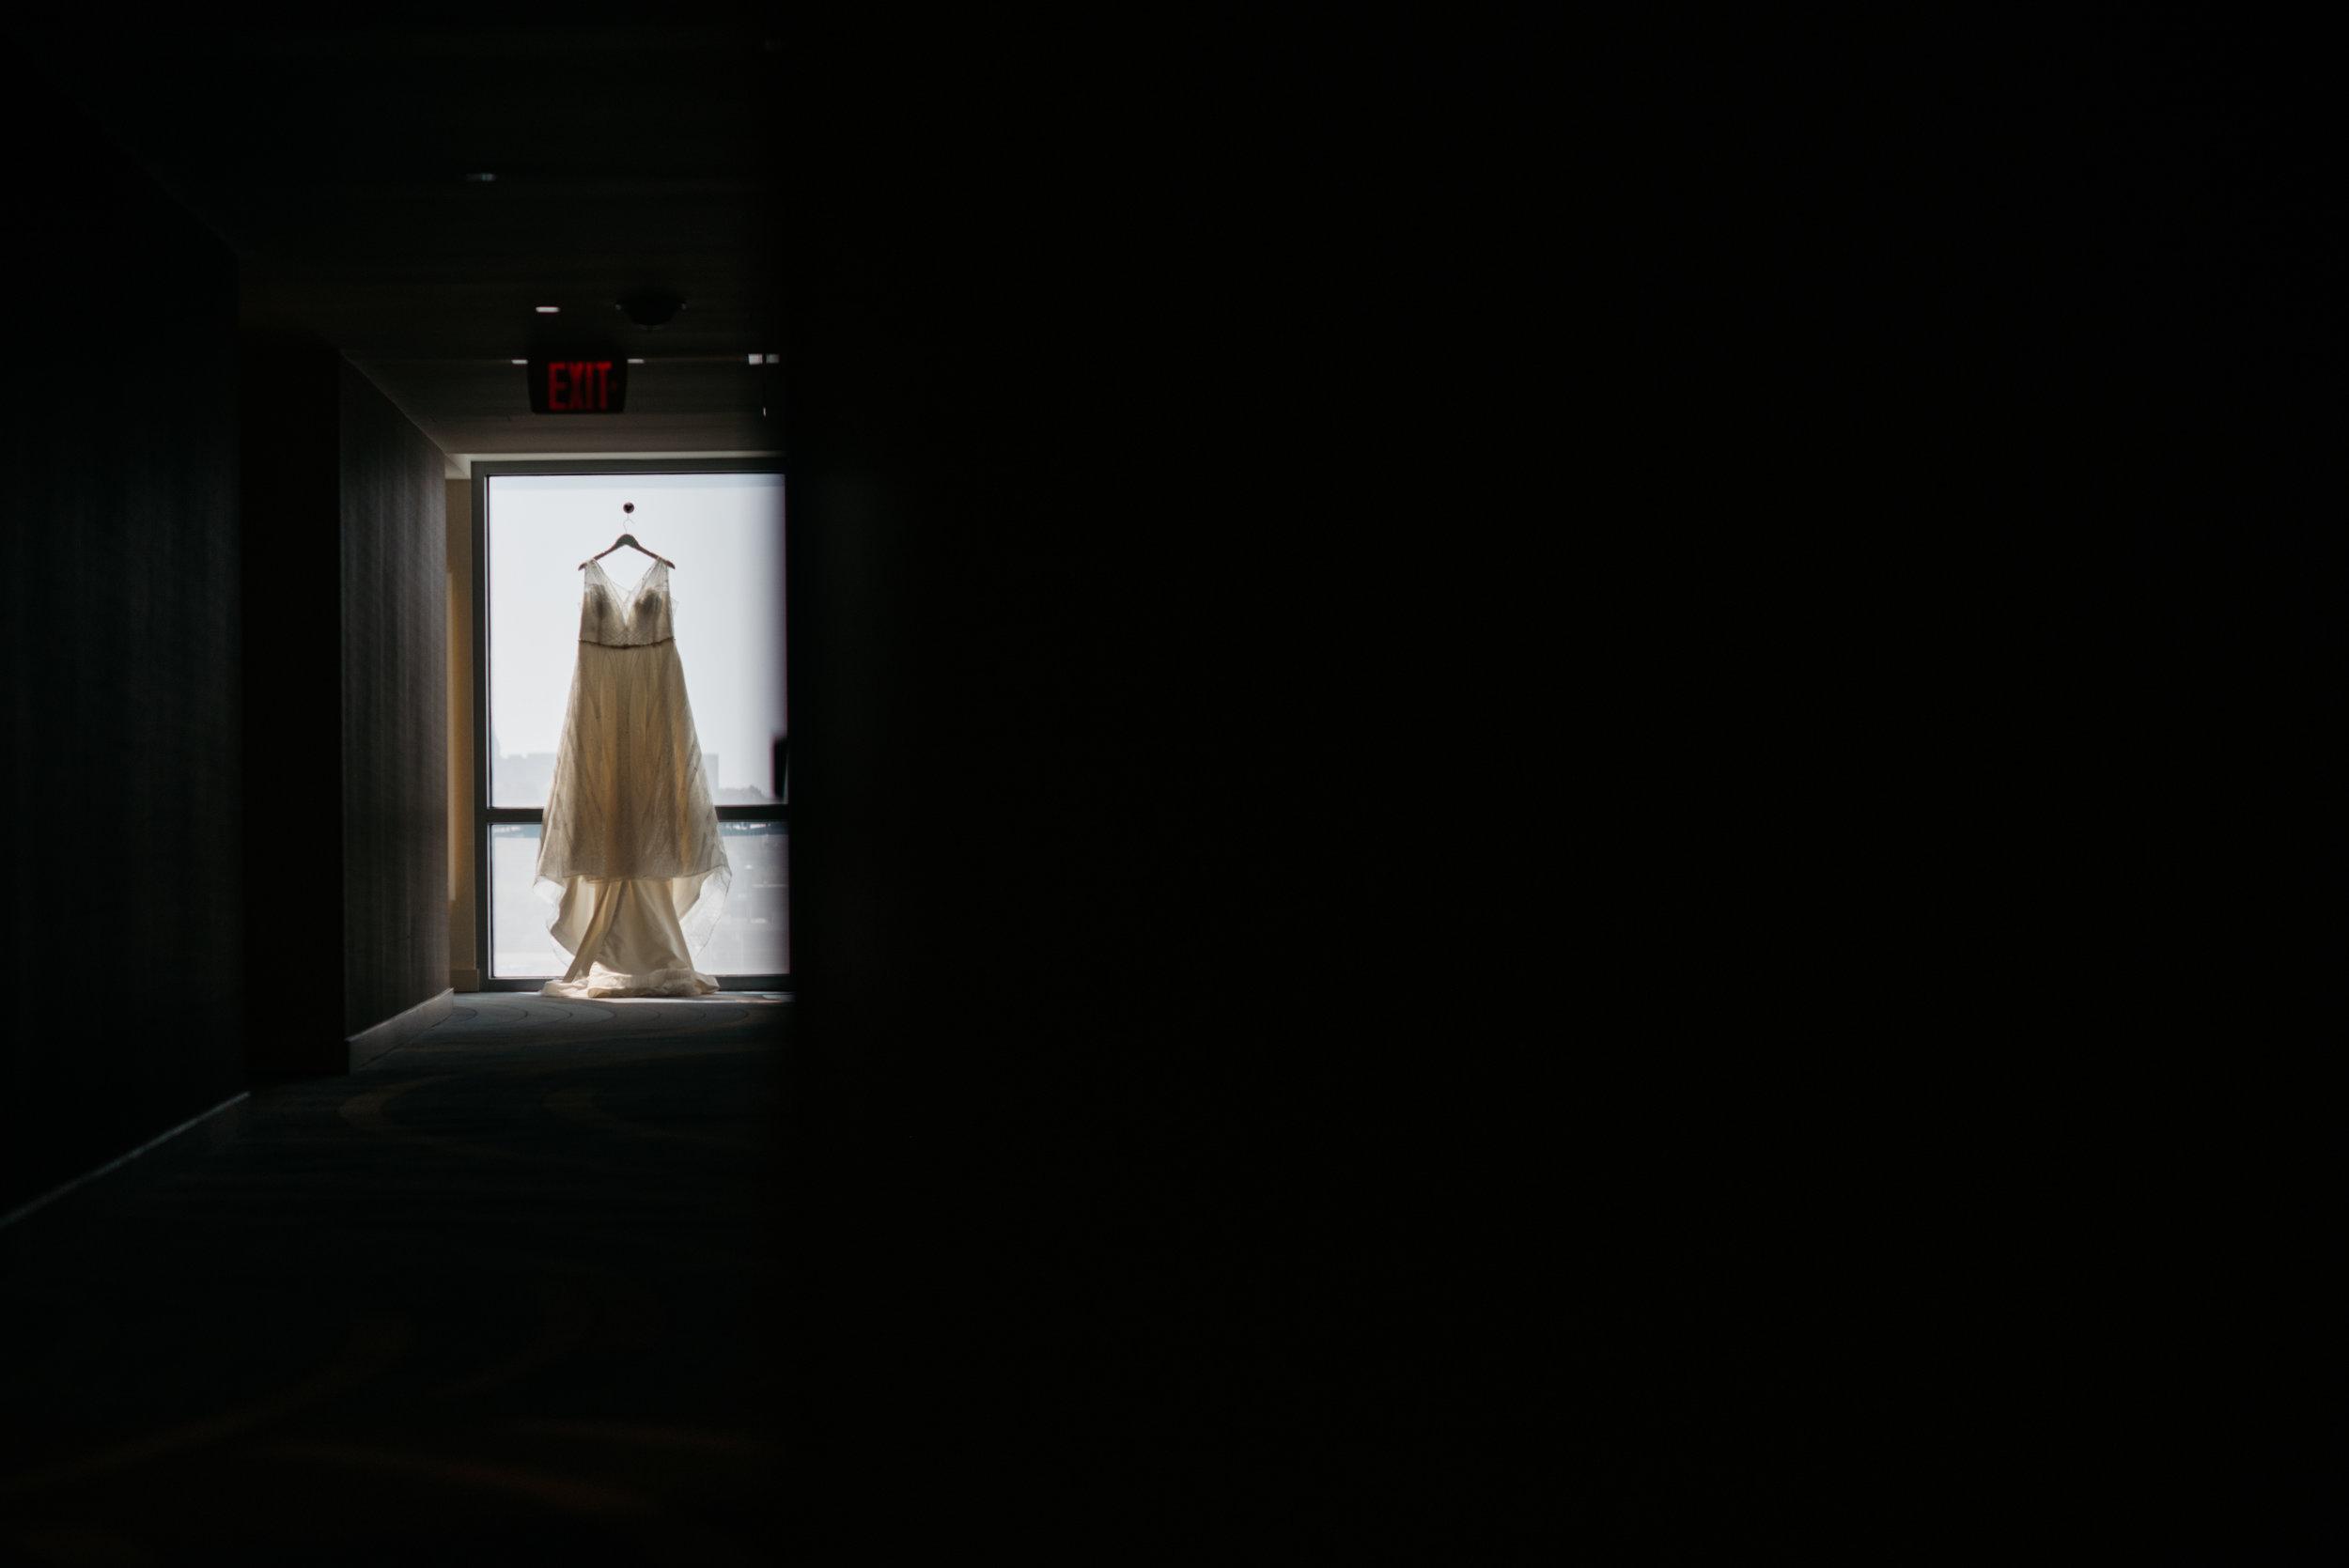 WeddingPhotos | NJPhotographer | Highlights-1-83.jpg